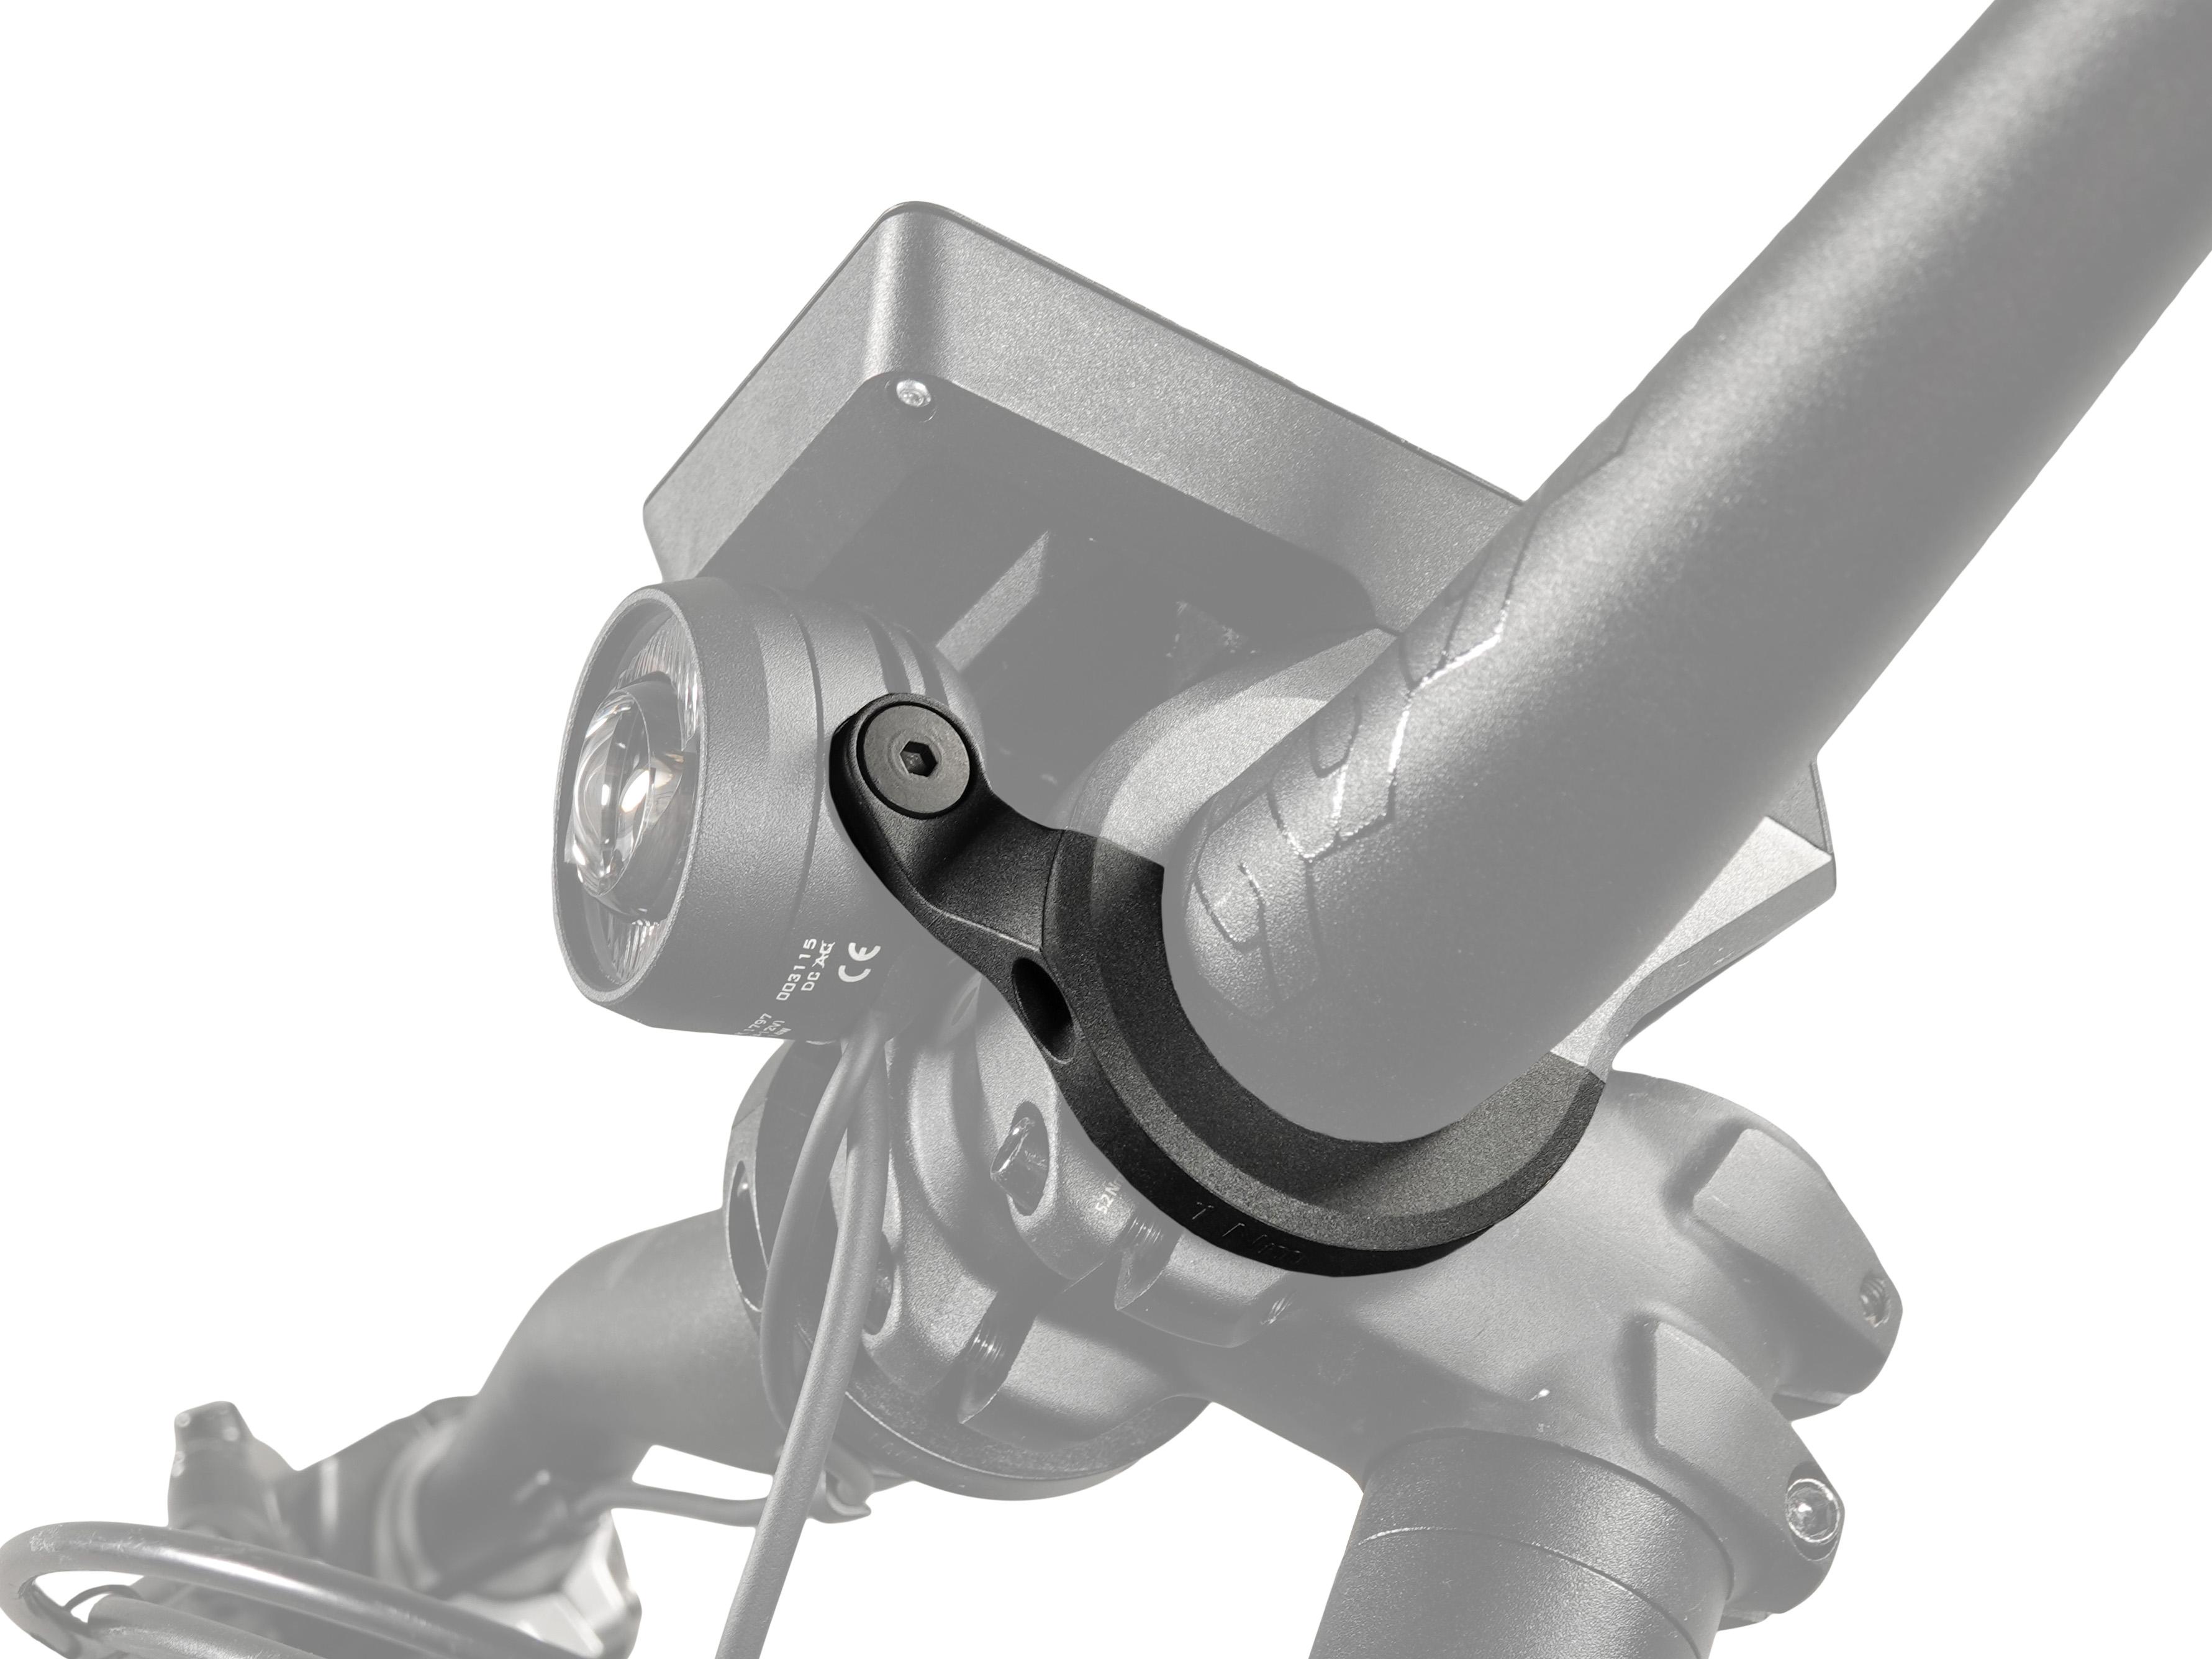 SL Nano Halter Bosch Intuvia/Nyon